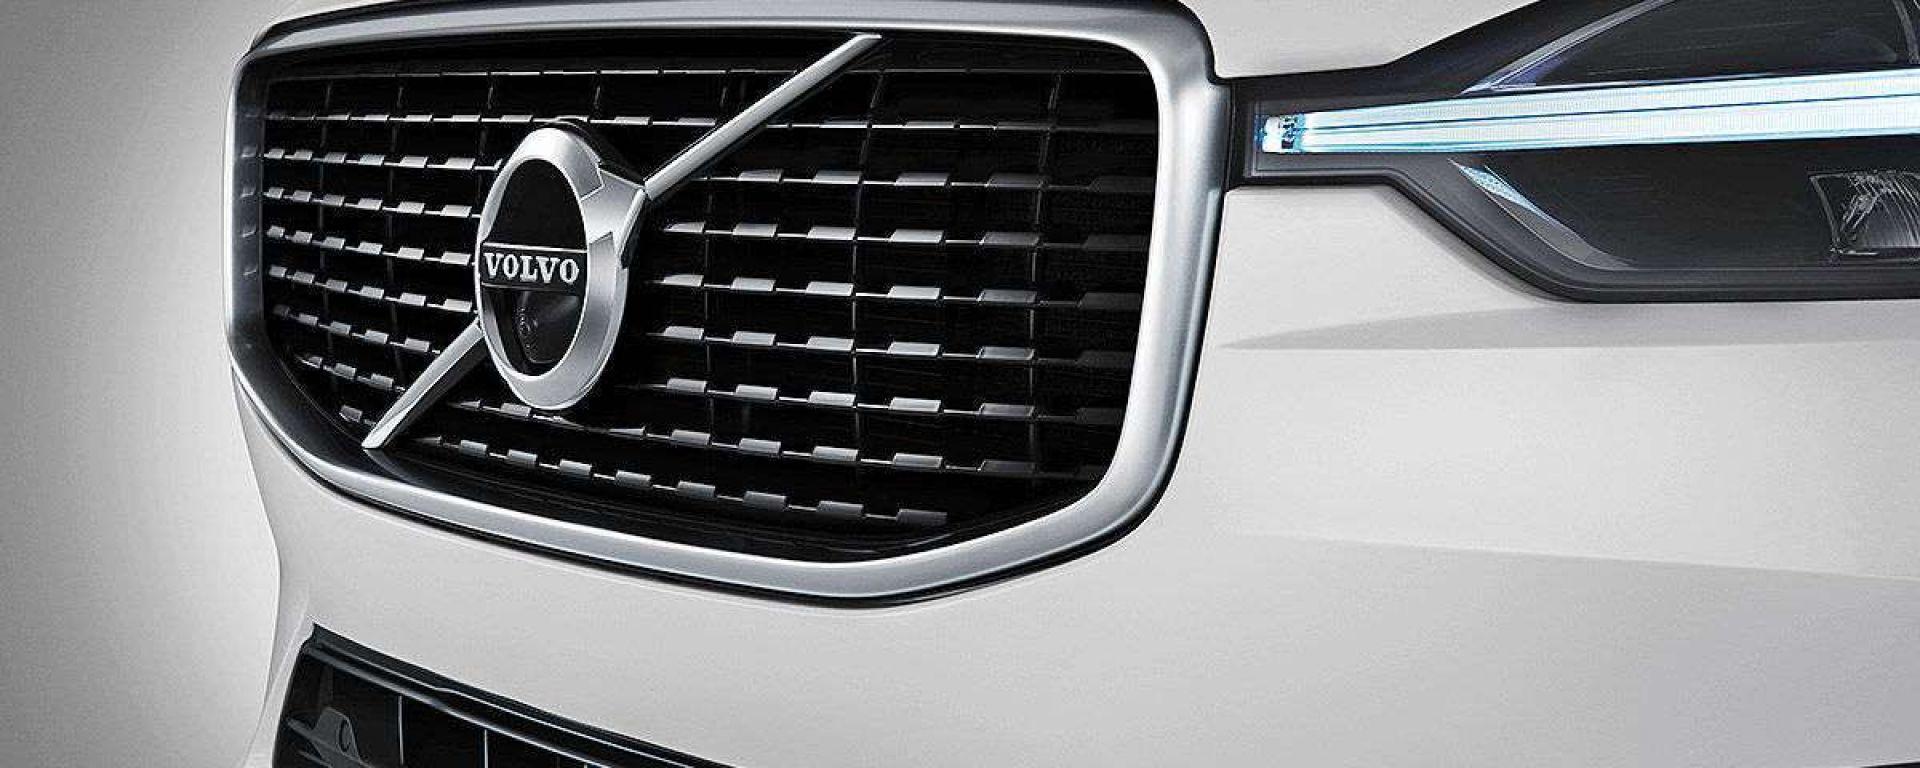 Volvo XC 60 2019, la calandra